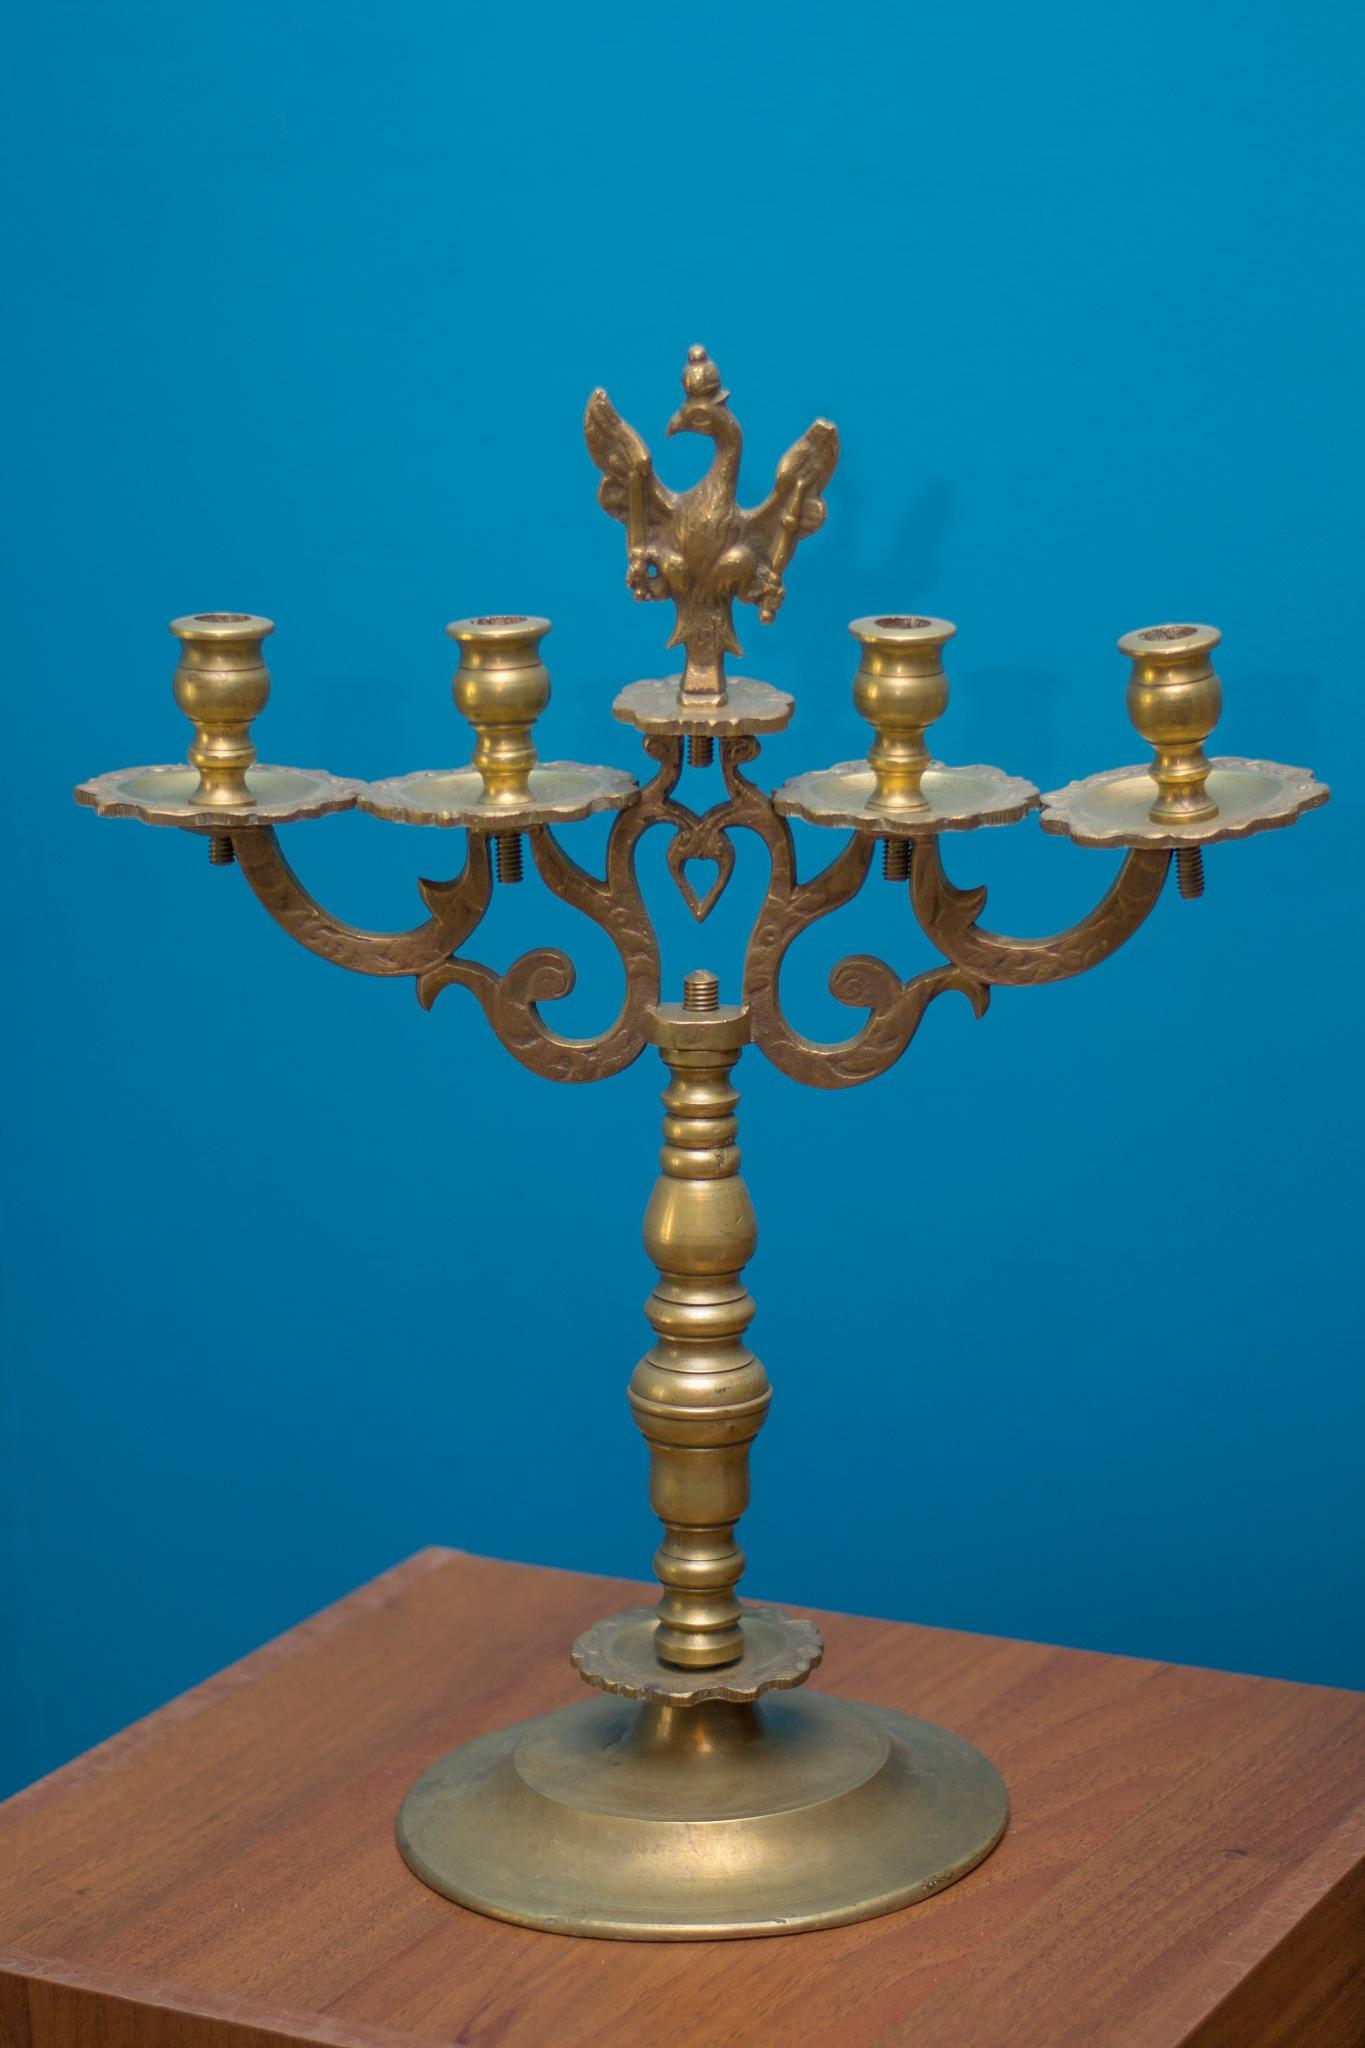 Antique candlestick by Roman Borshovskyy